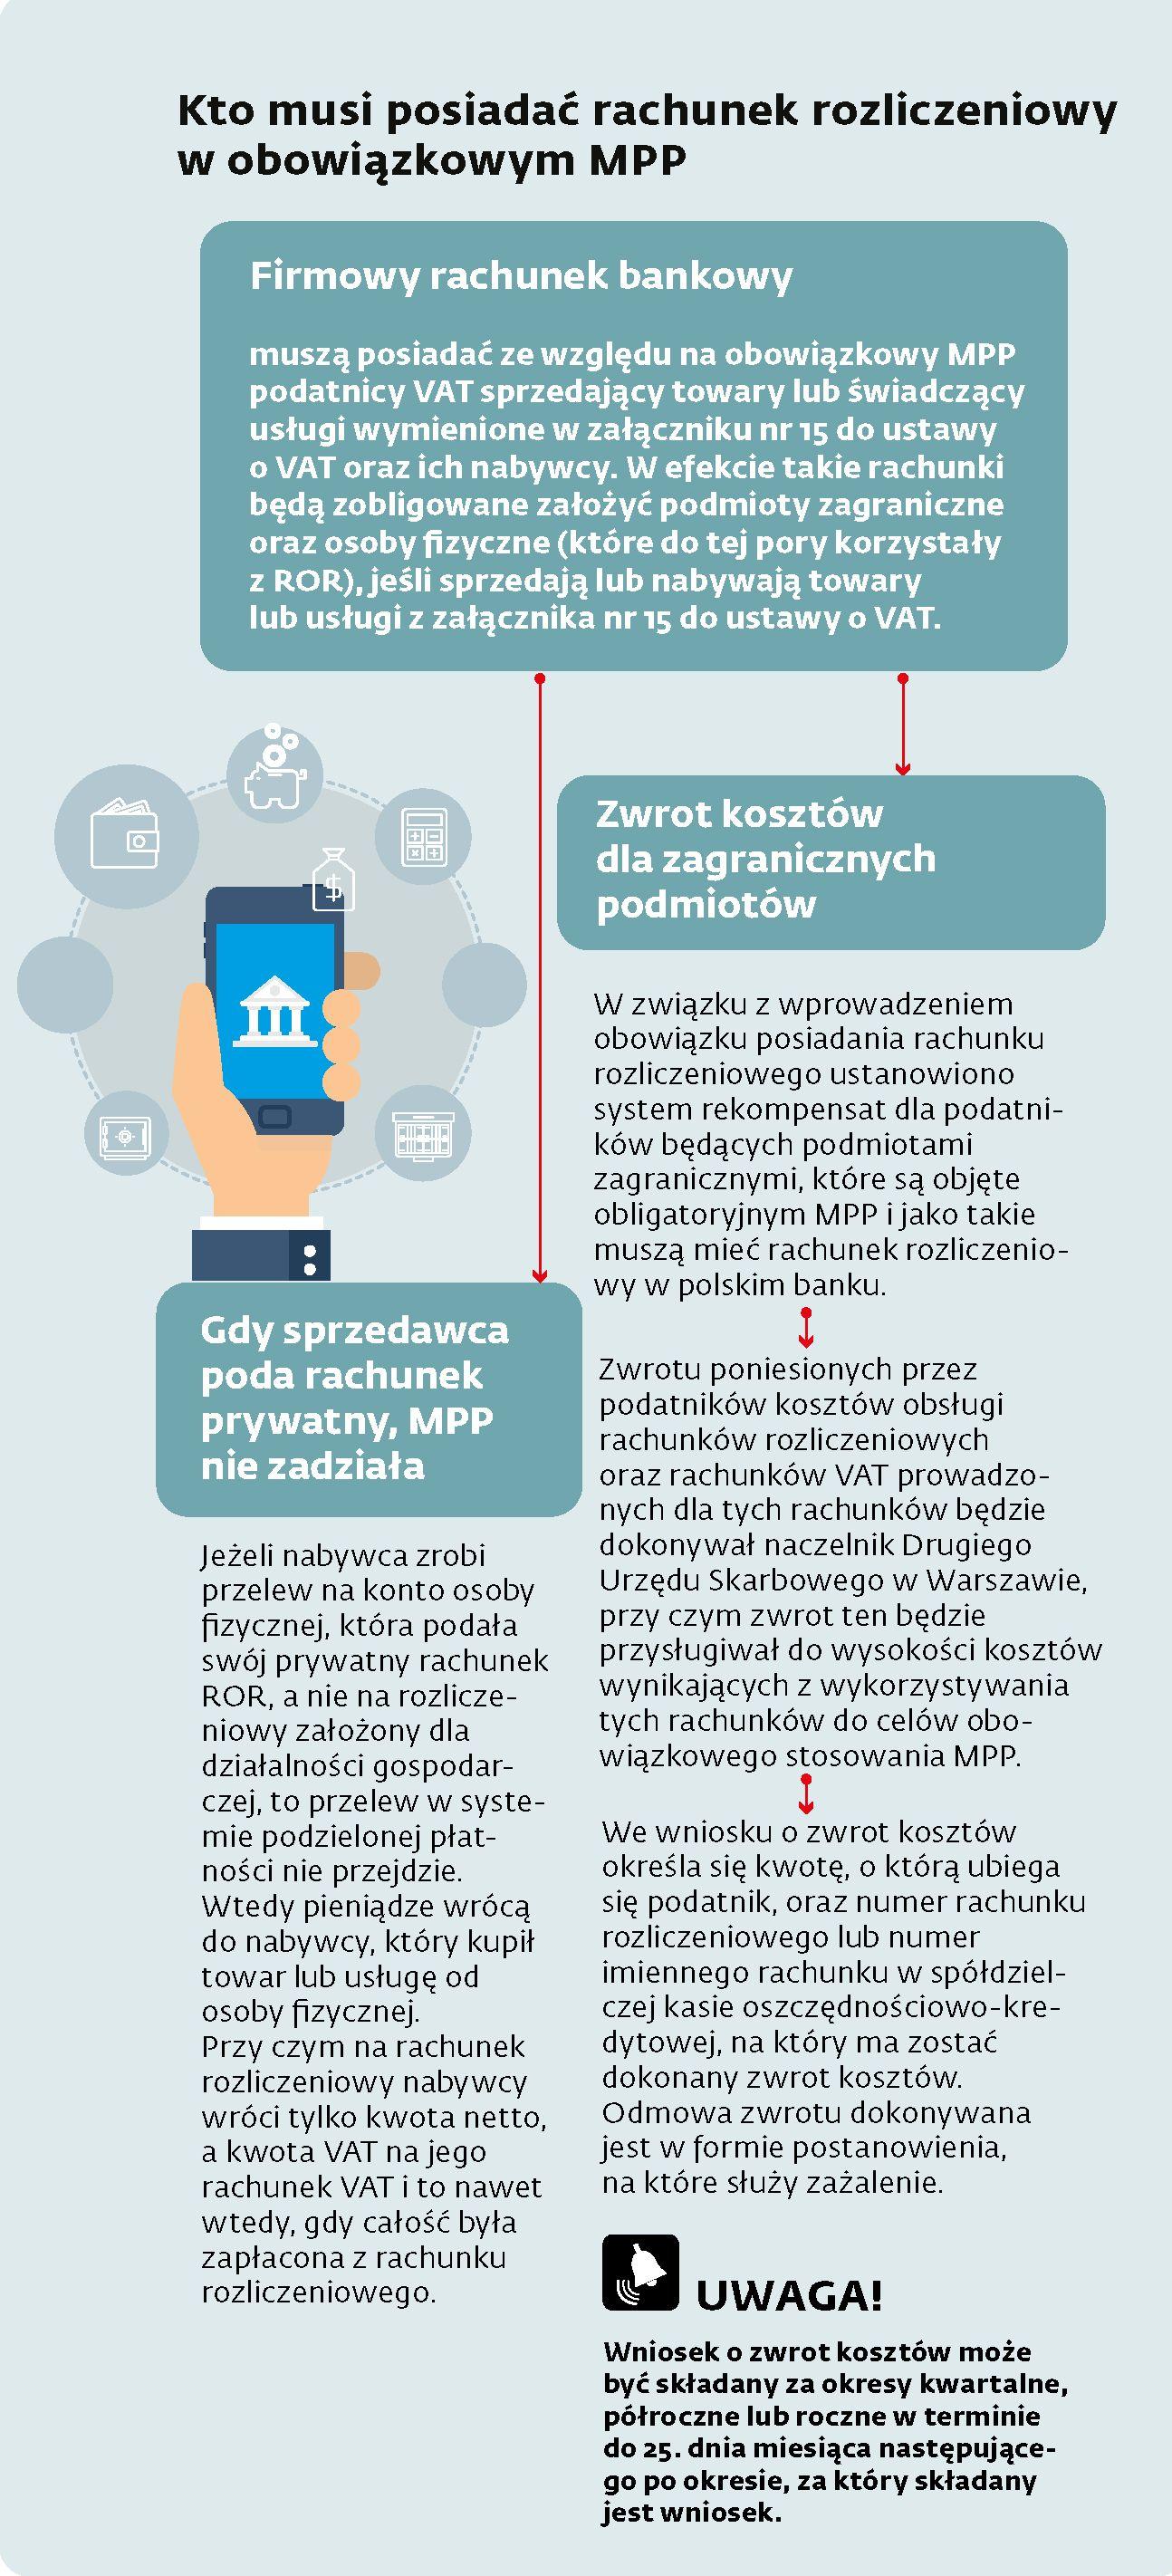 MPP - kto musi posiadać rachunek